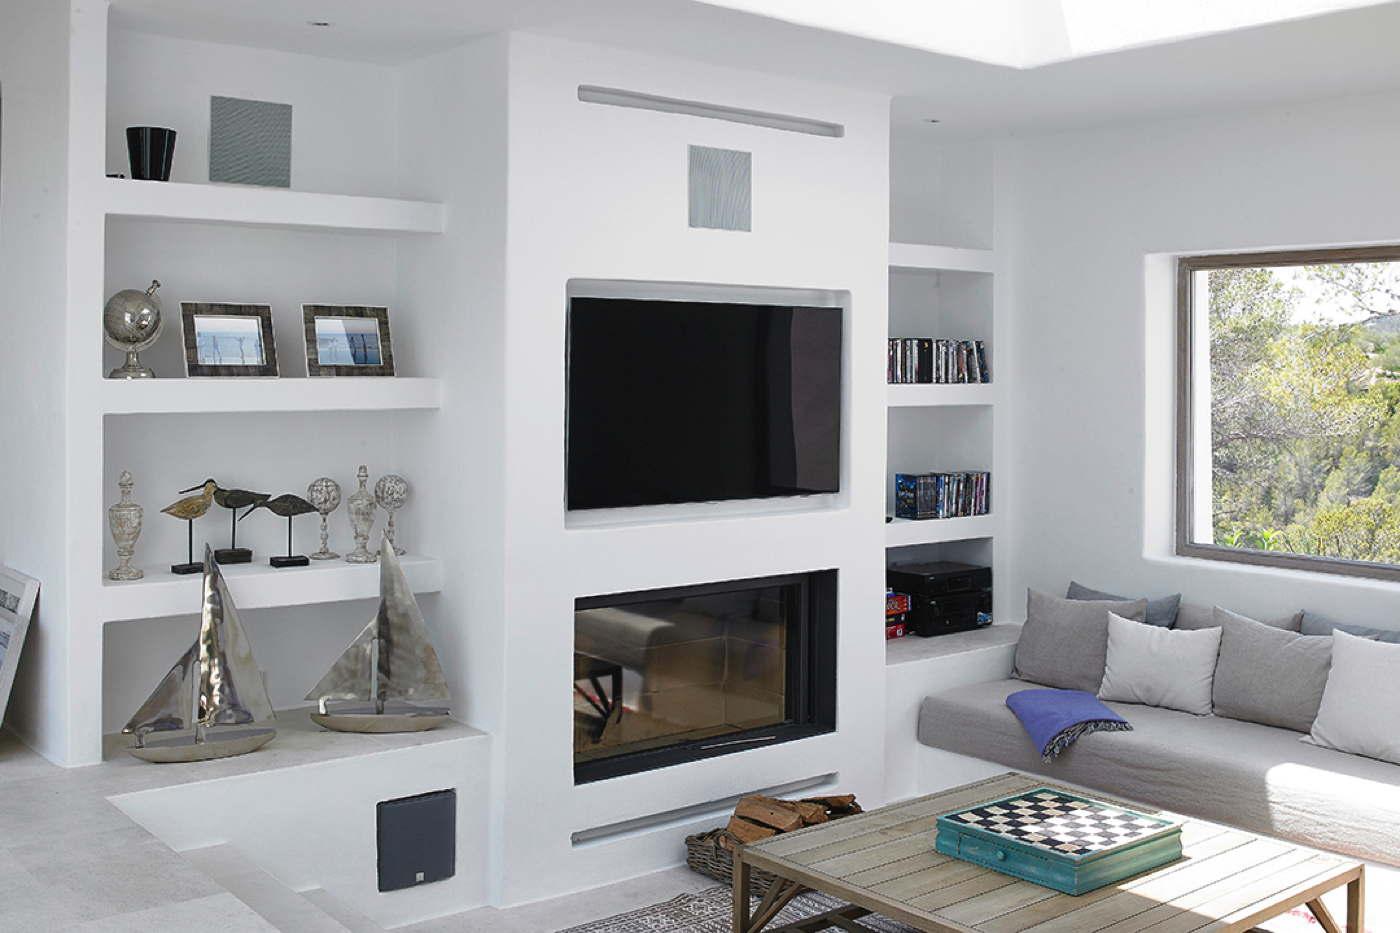 Luxury villa design villa ibiza for holiday rental - Chimeneas modernas ...